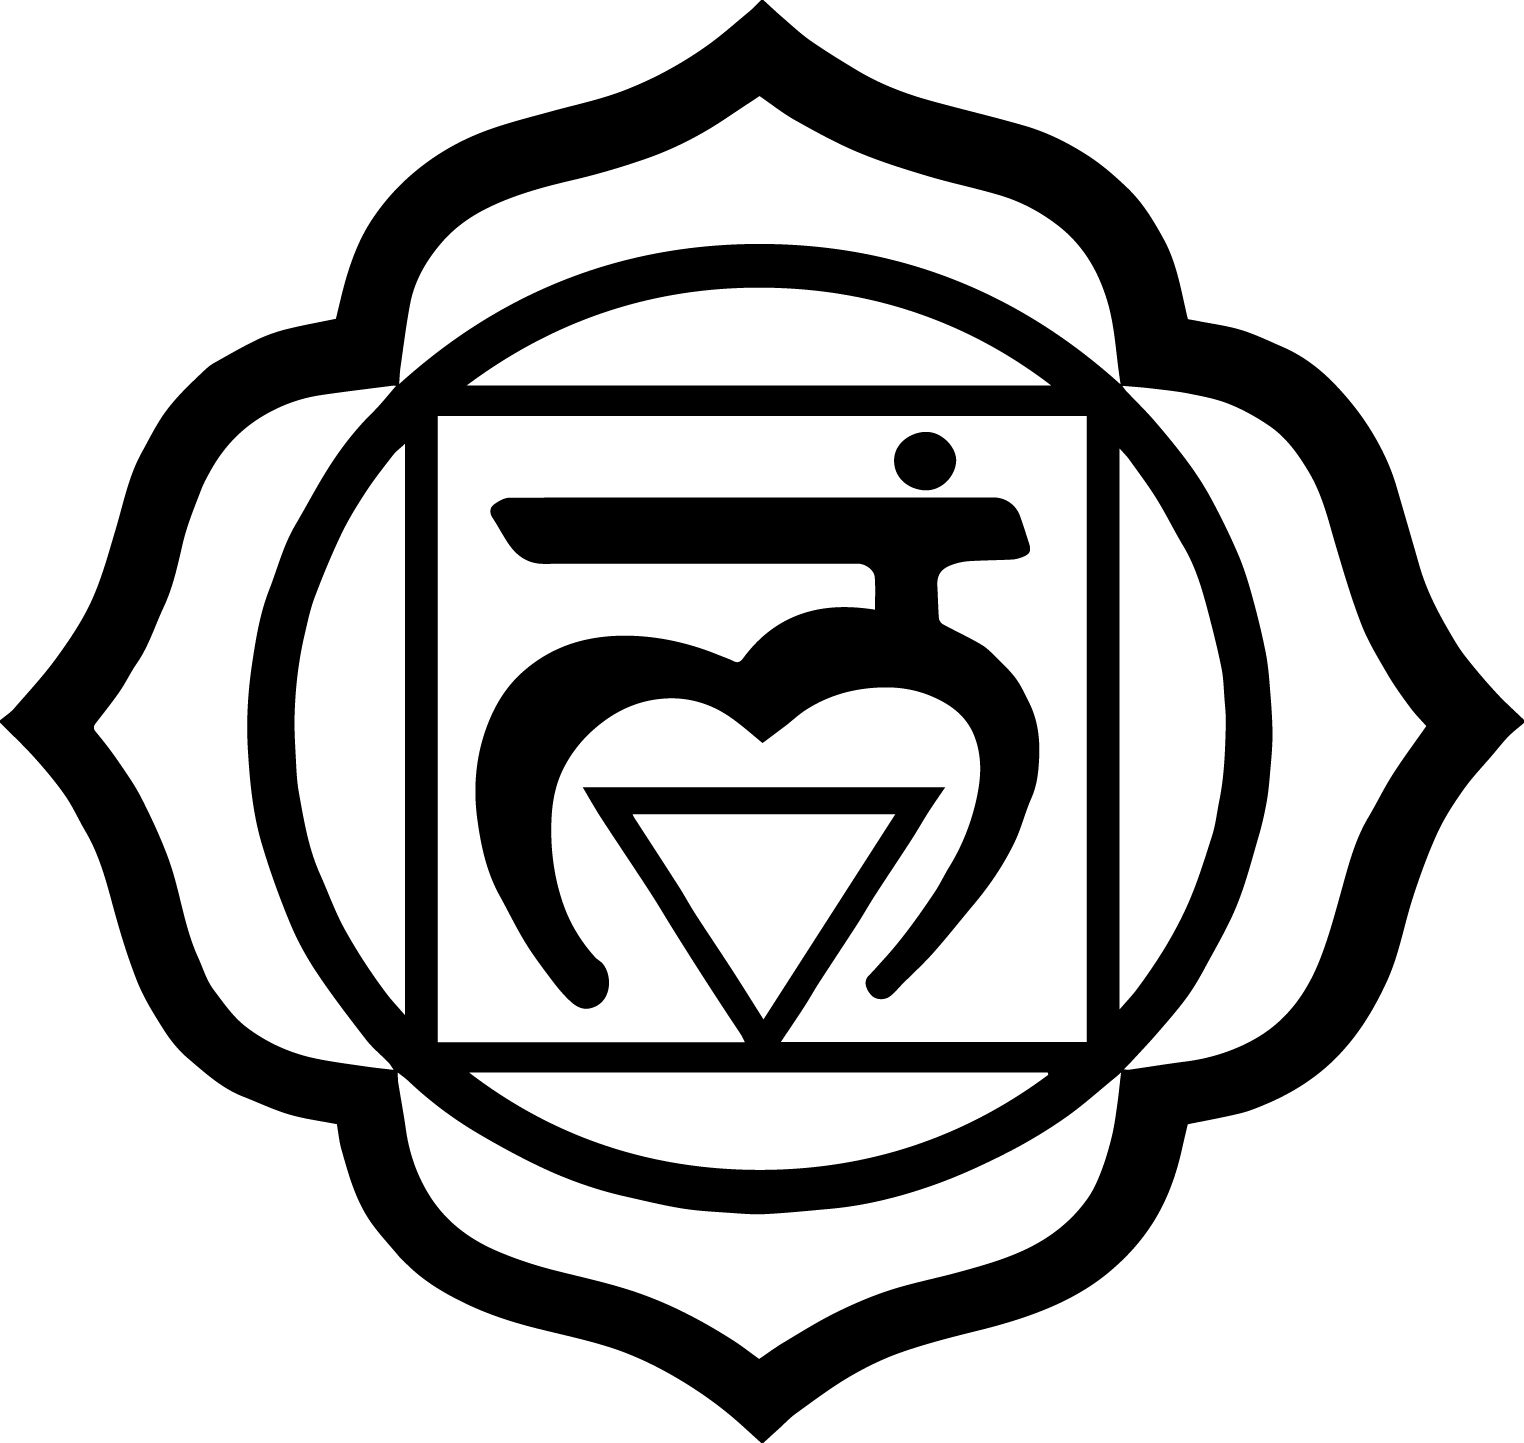 Muladhara 1 Chakra Symbol Or Root Chakra Is Symbolized By A Lotus